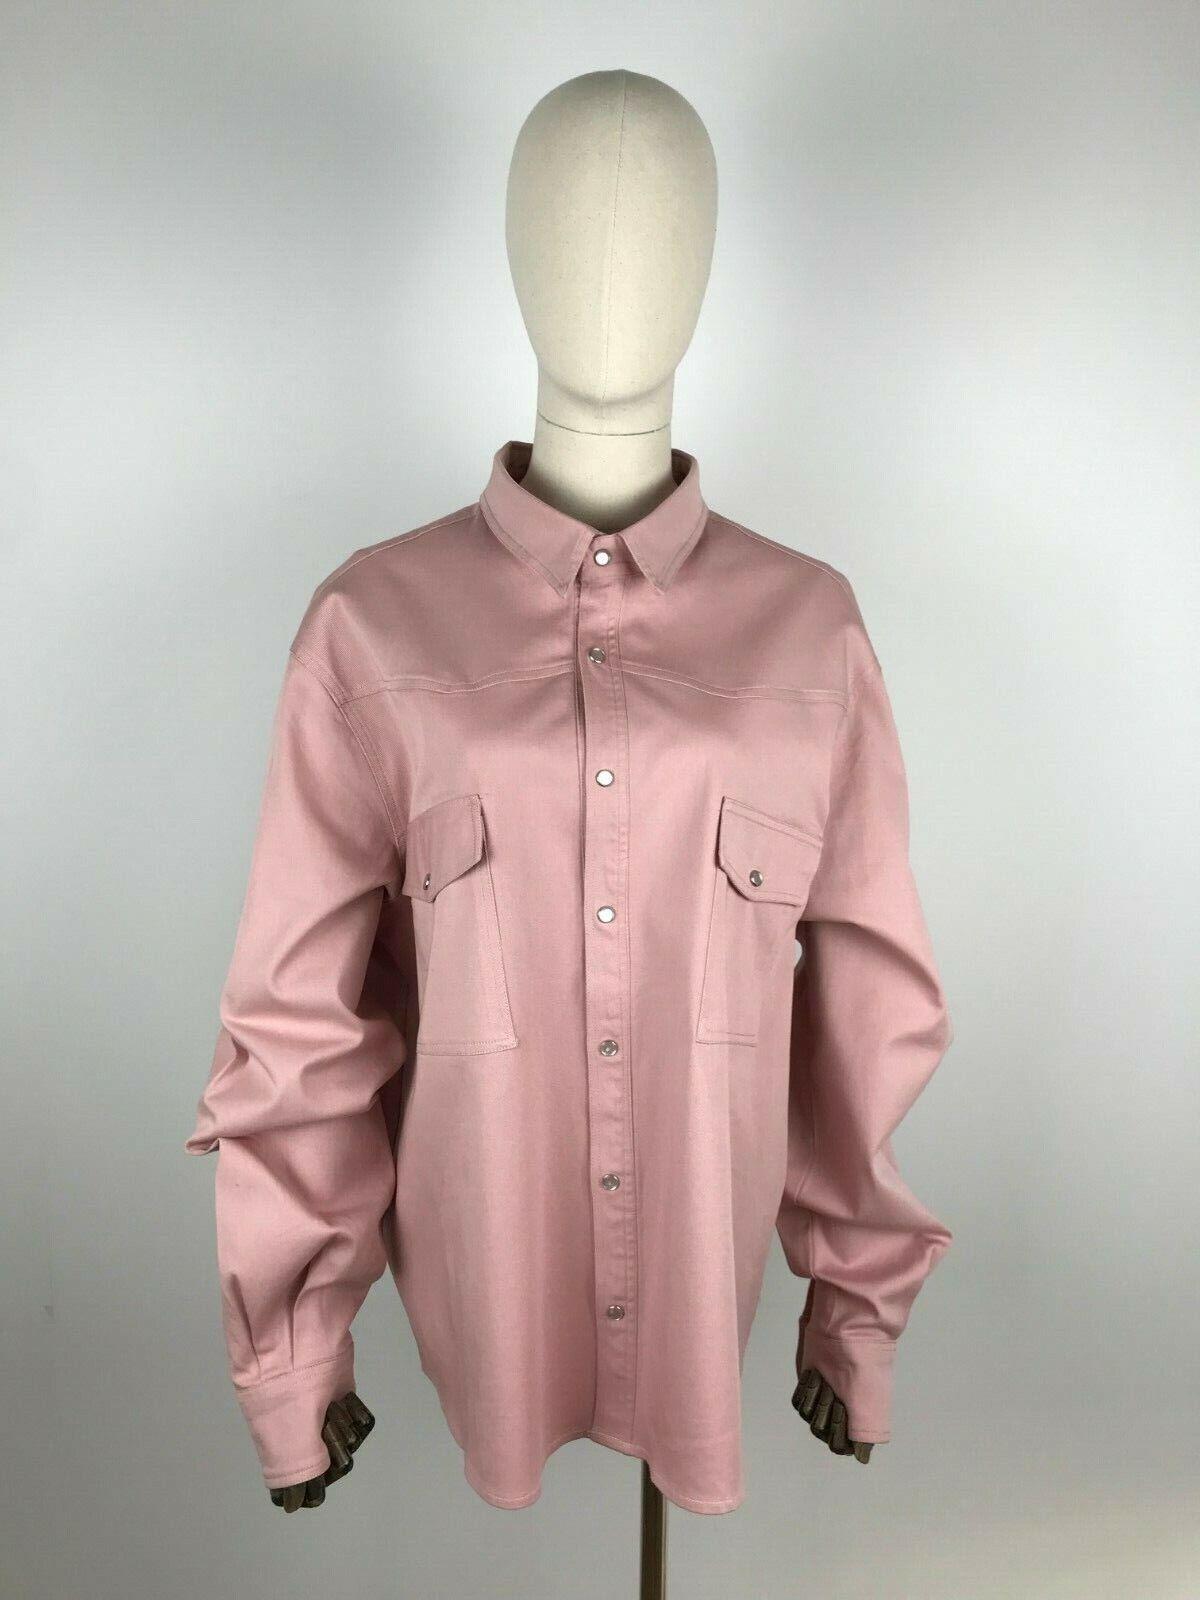 Damen Woman CHAFOR JeansBlause Jeanshemd Hemd Denim Blouse Shirt Rosa Rosa 56